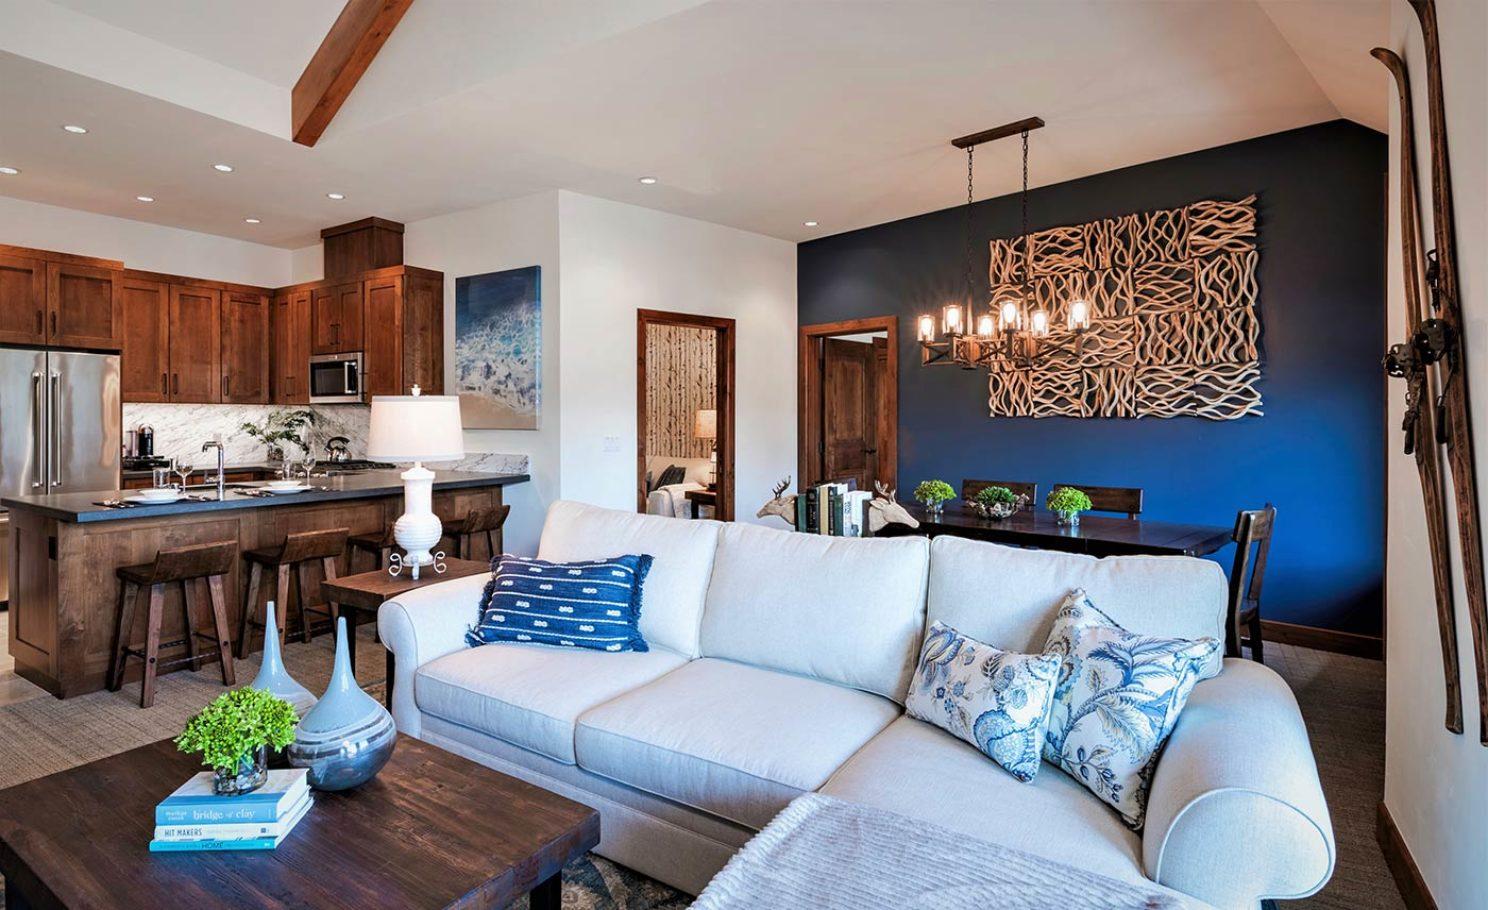 Zalanta Living Room - Talie Jane Interiors